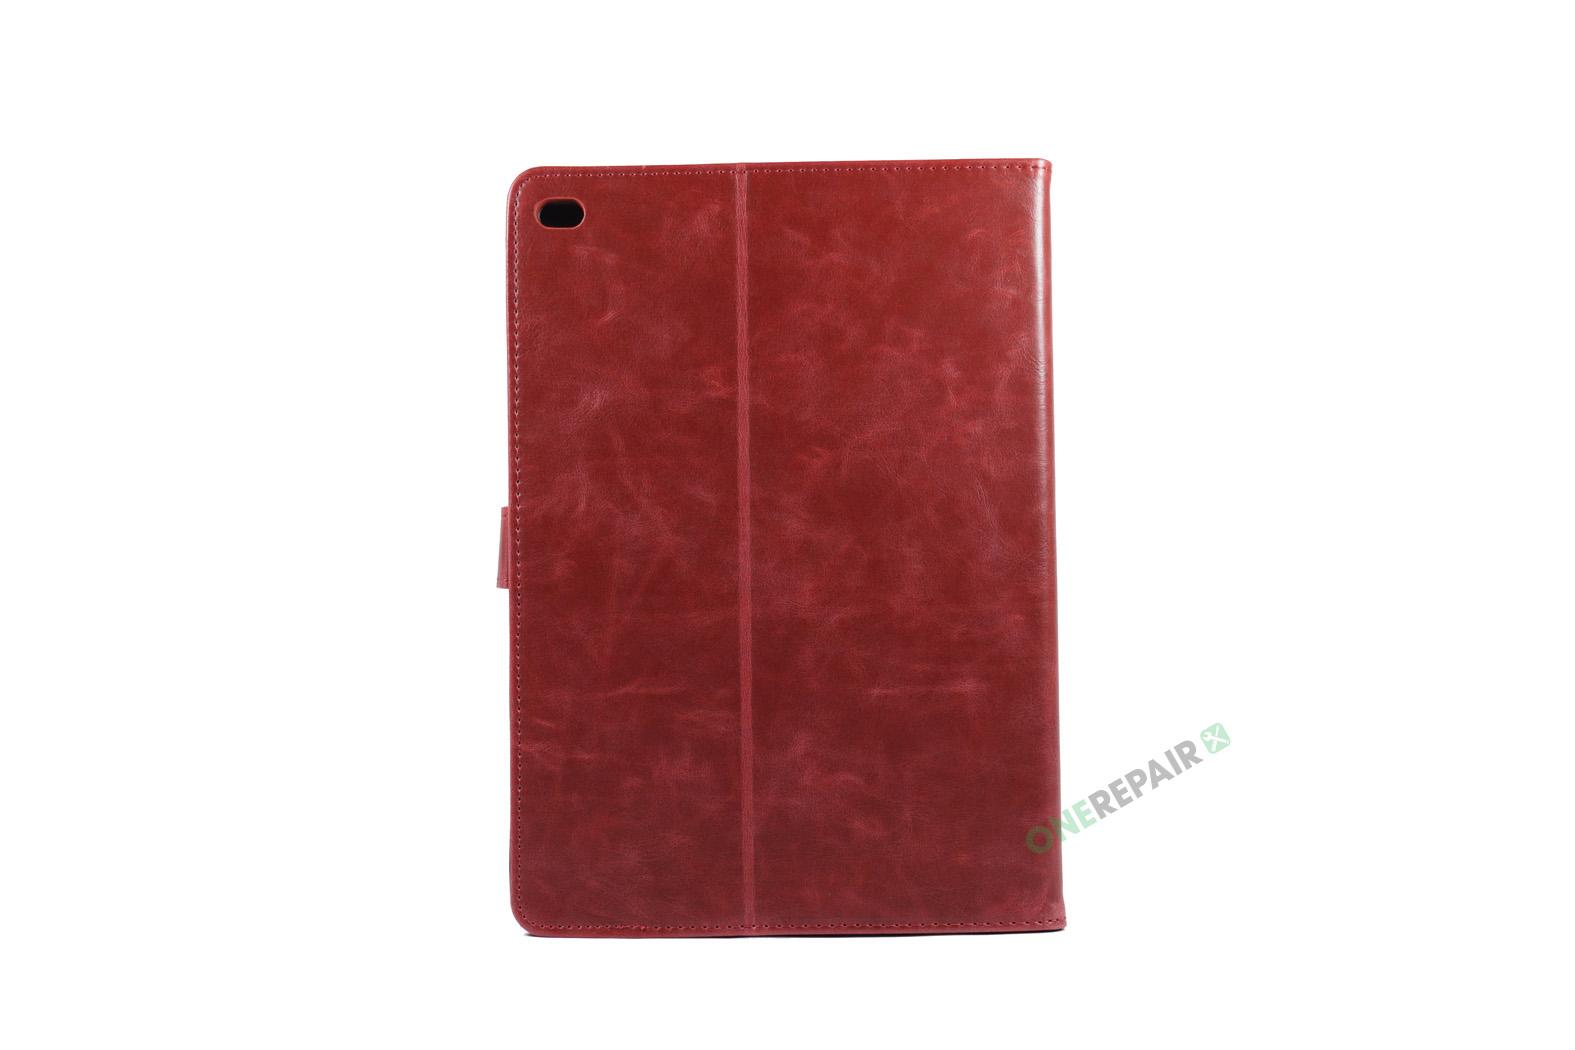 351756_iPad_Air2_2_A1566_A1567_Flipcover_Boeg_Roedbrun_Brun_Roed_Book_00002